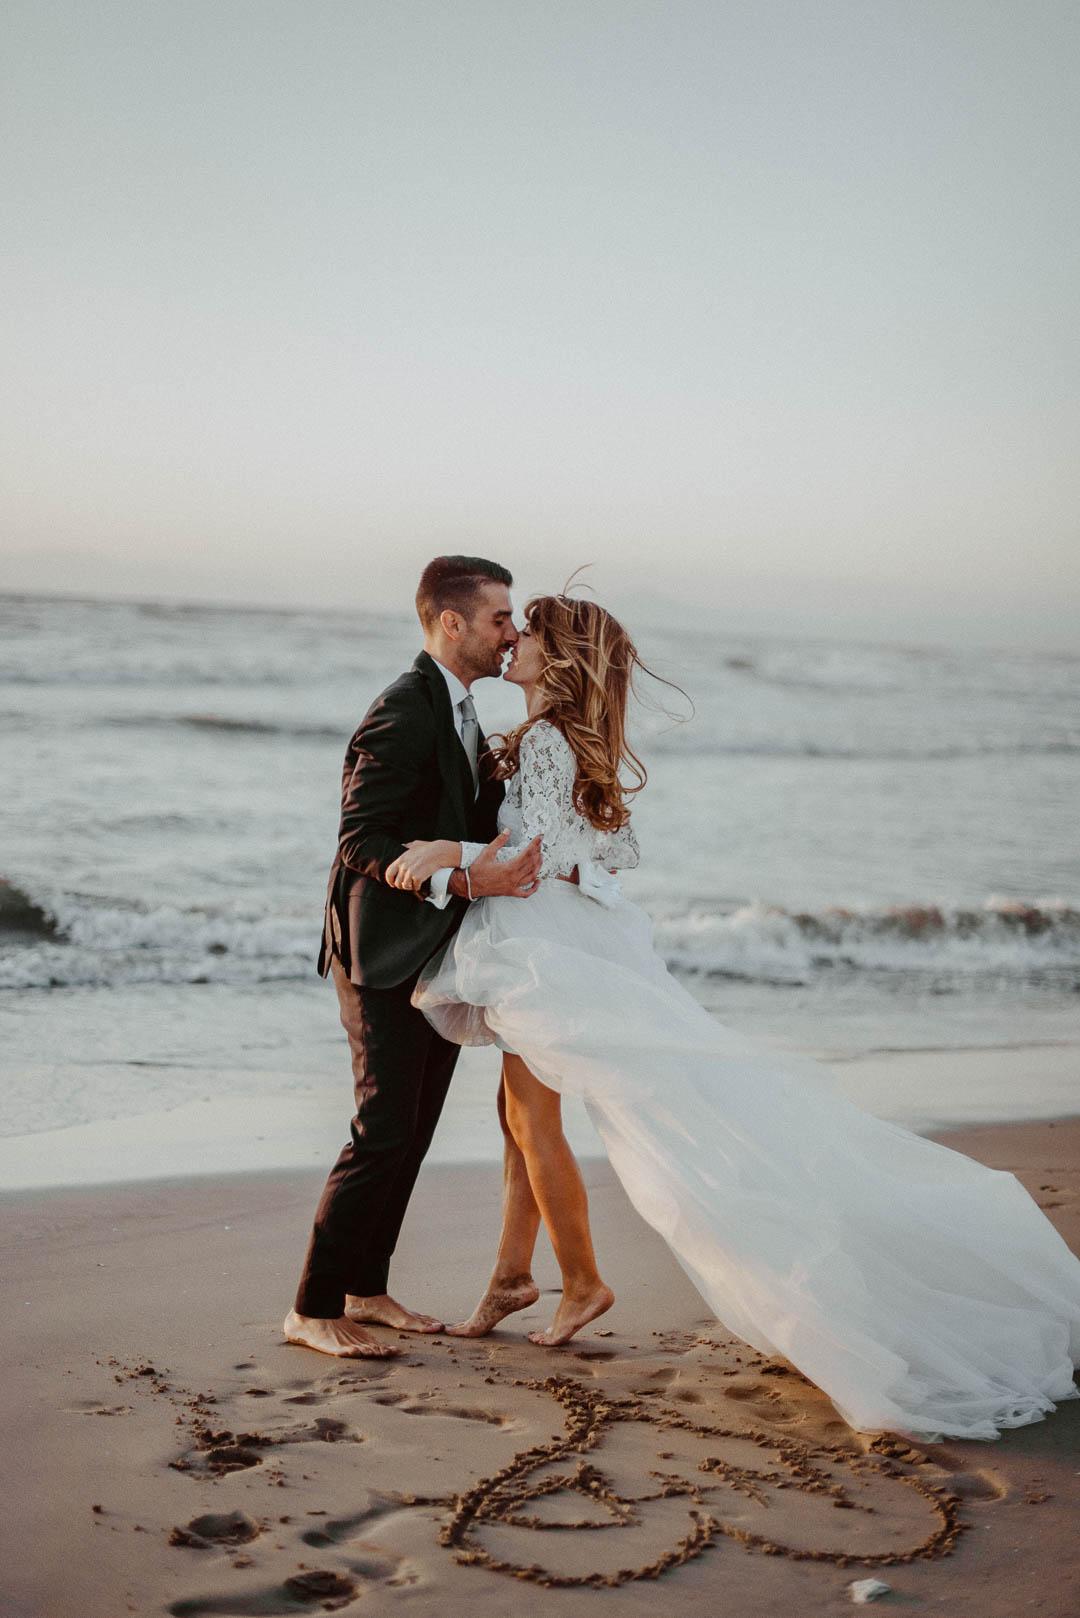 wedding-photographer-destination-fineart-bespoke-reportage-napoli-nabilah-vivianeizzo-spazio46-118